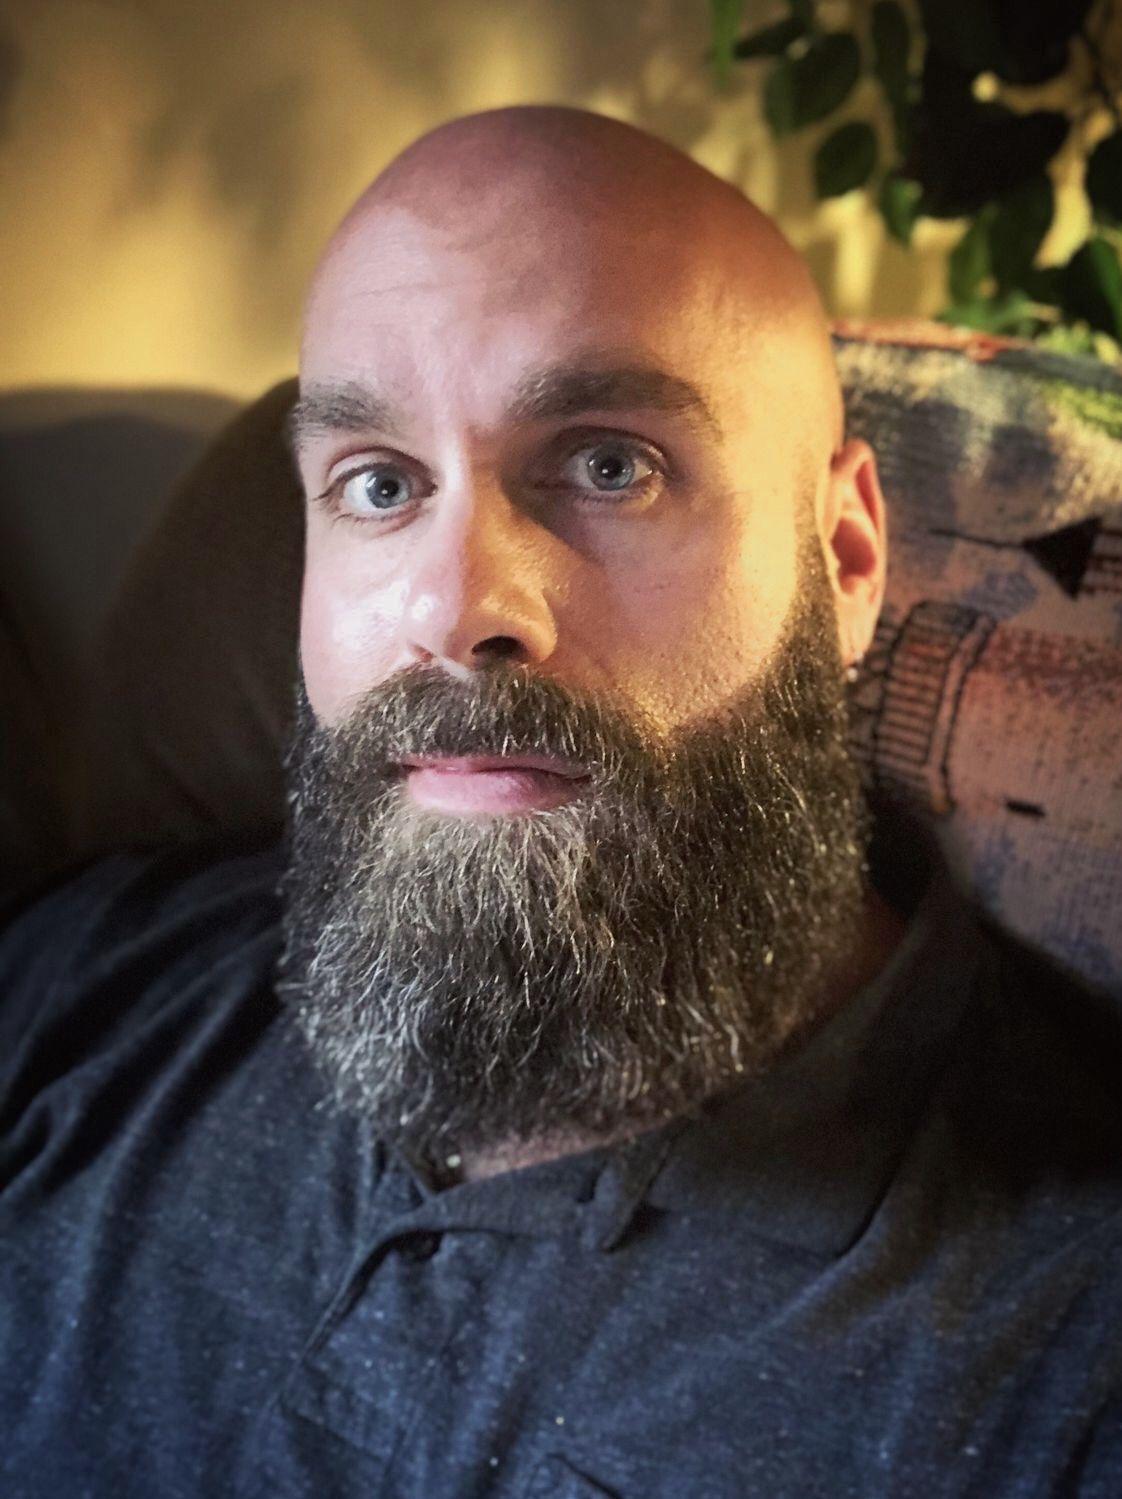 8-Striking-Photos-That-Prove-a-Beard-Makes-Men